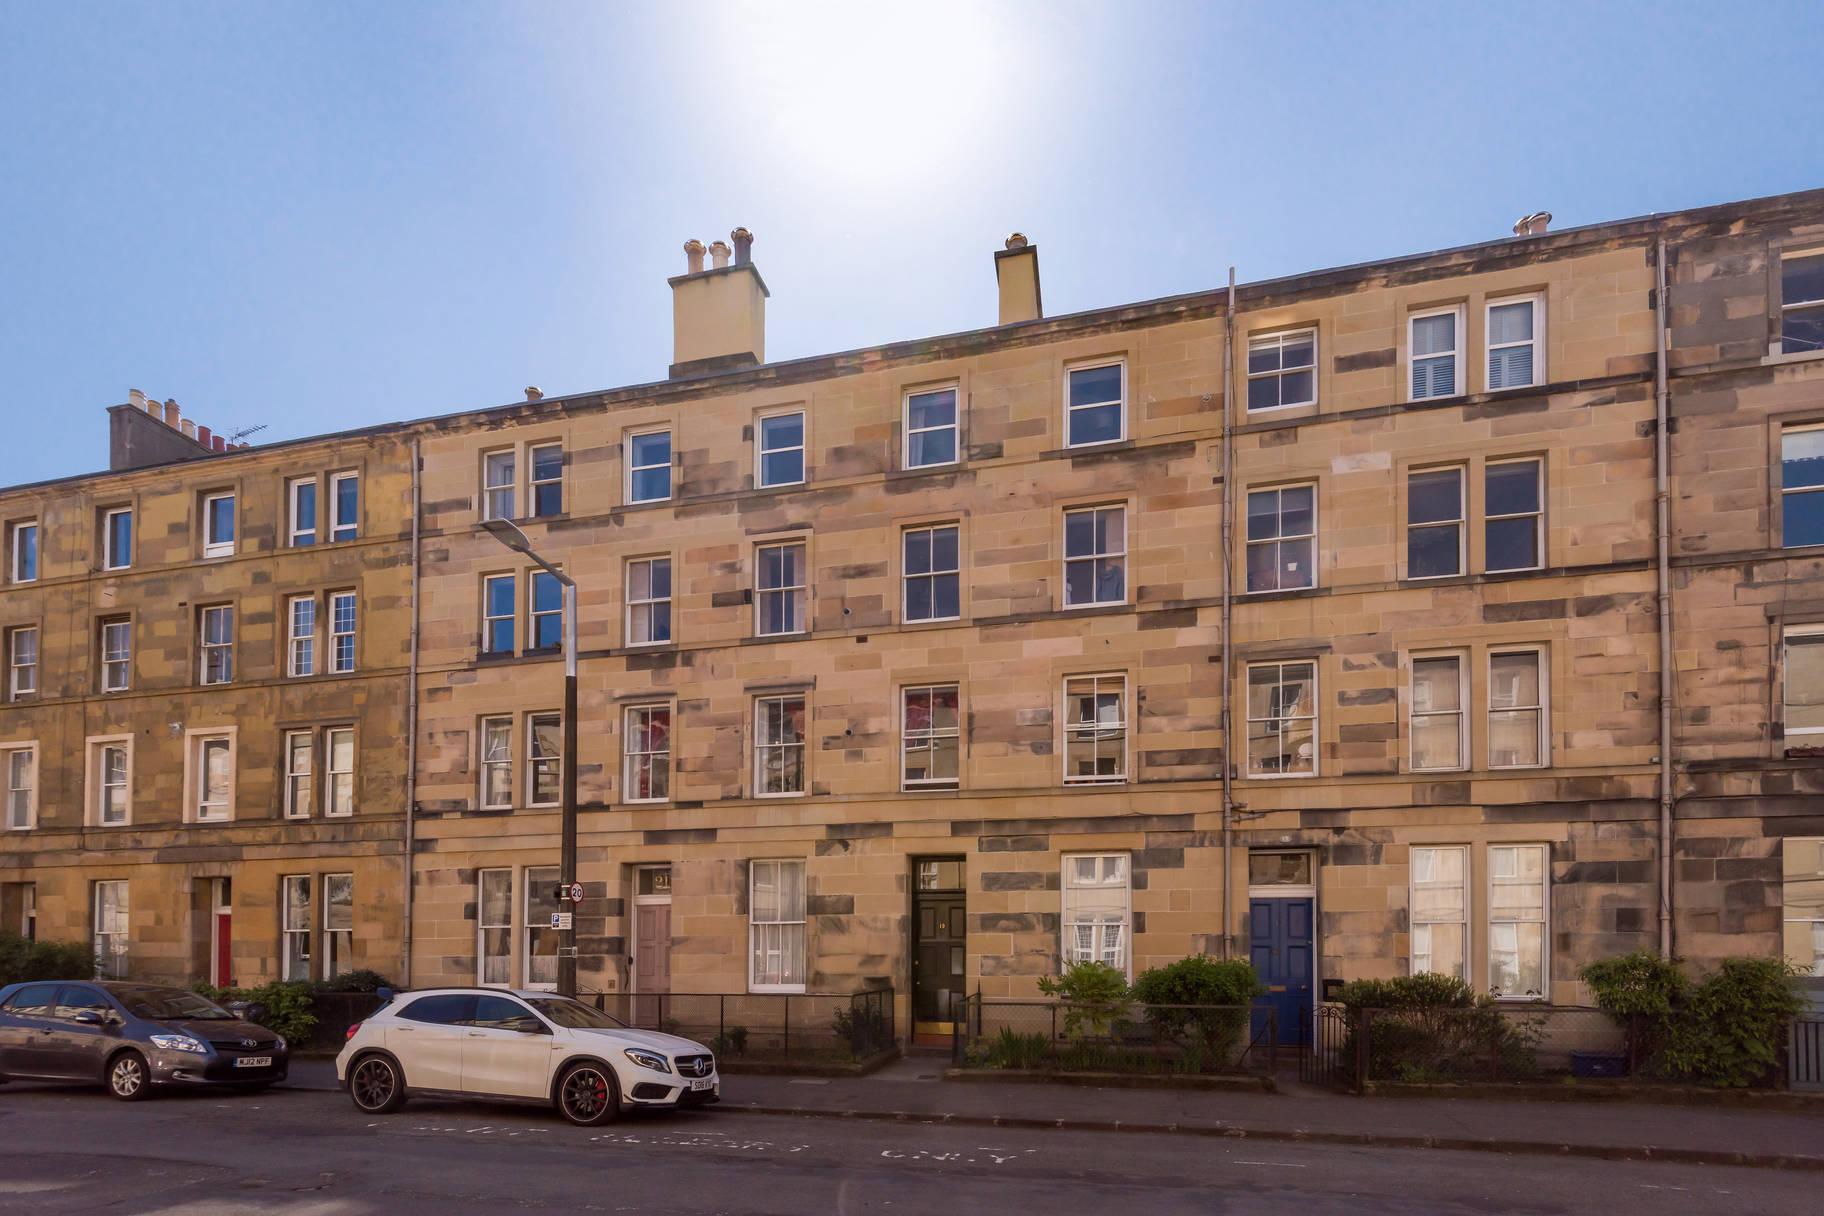 19 (1F3) Panmure Place, Tollcross, Edinburgh, EH3 9HP